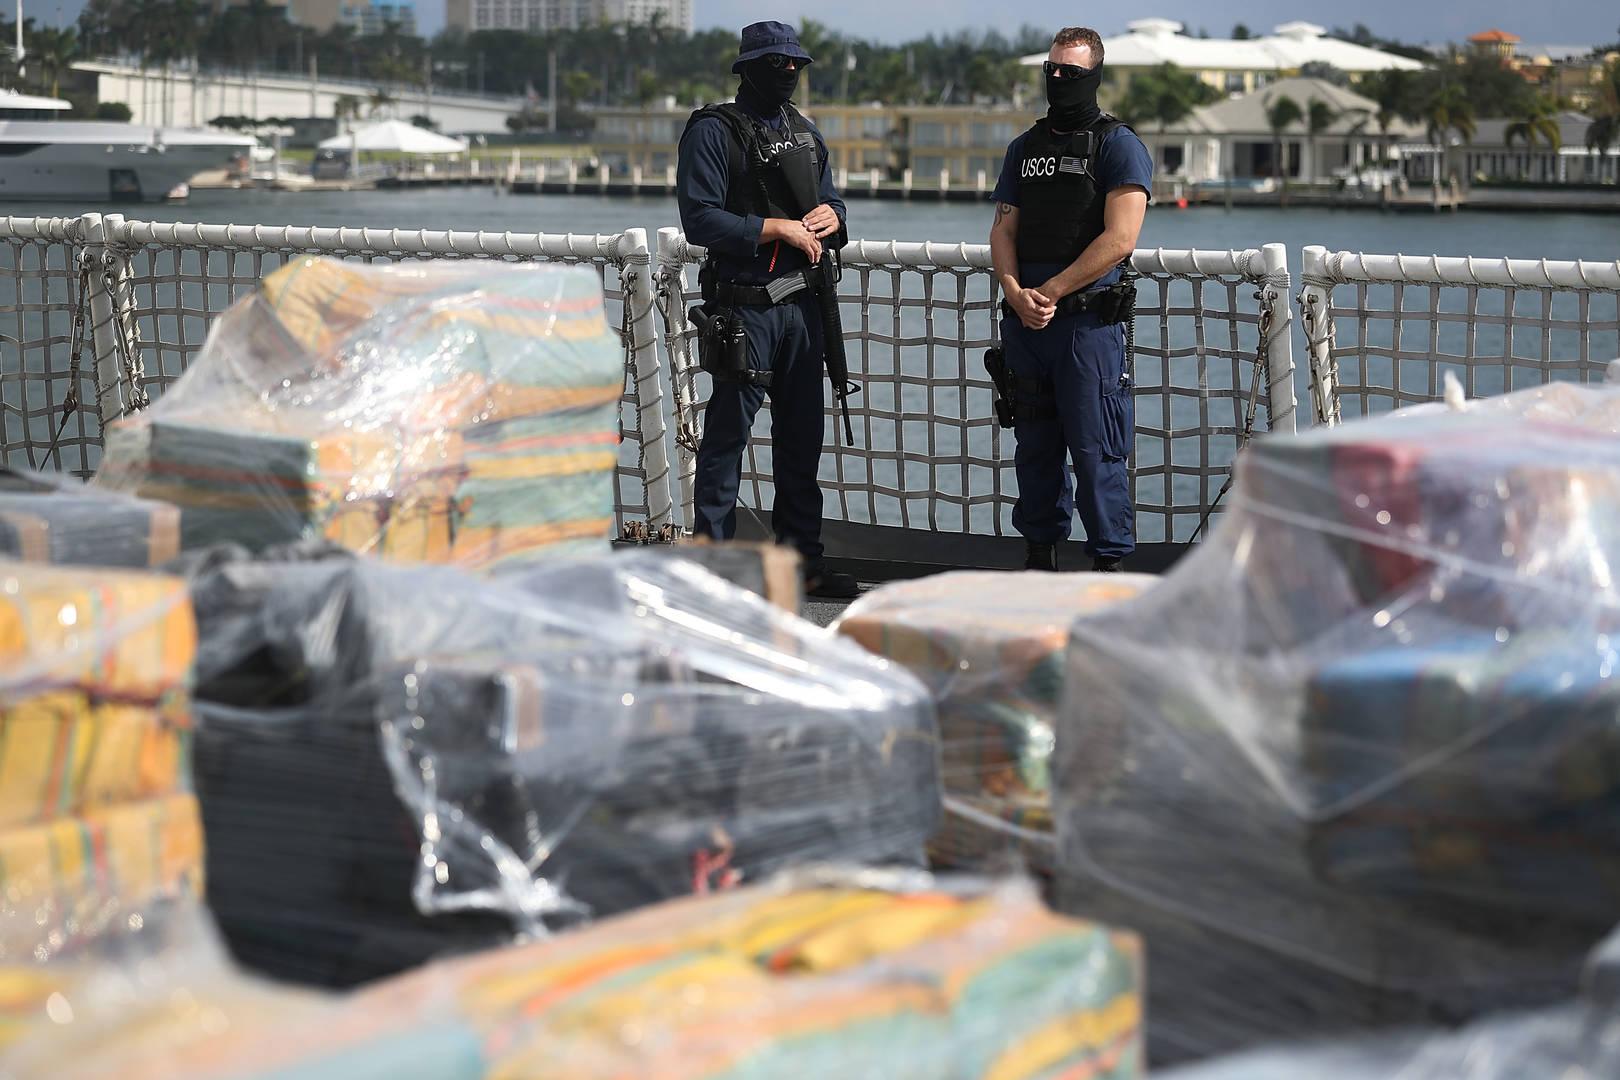 $1 Billion Worth of Cocaine Seized in Philadelphia Raid